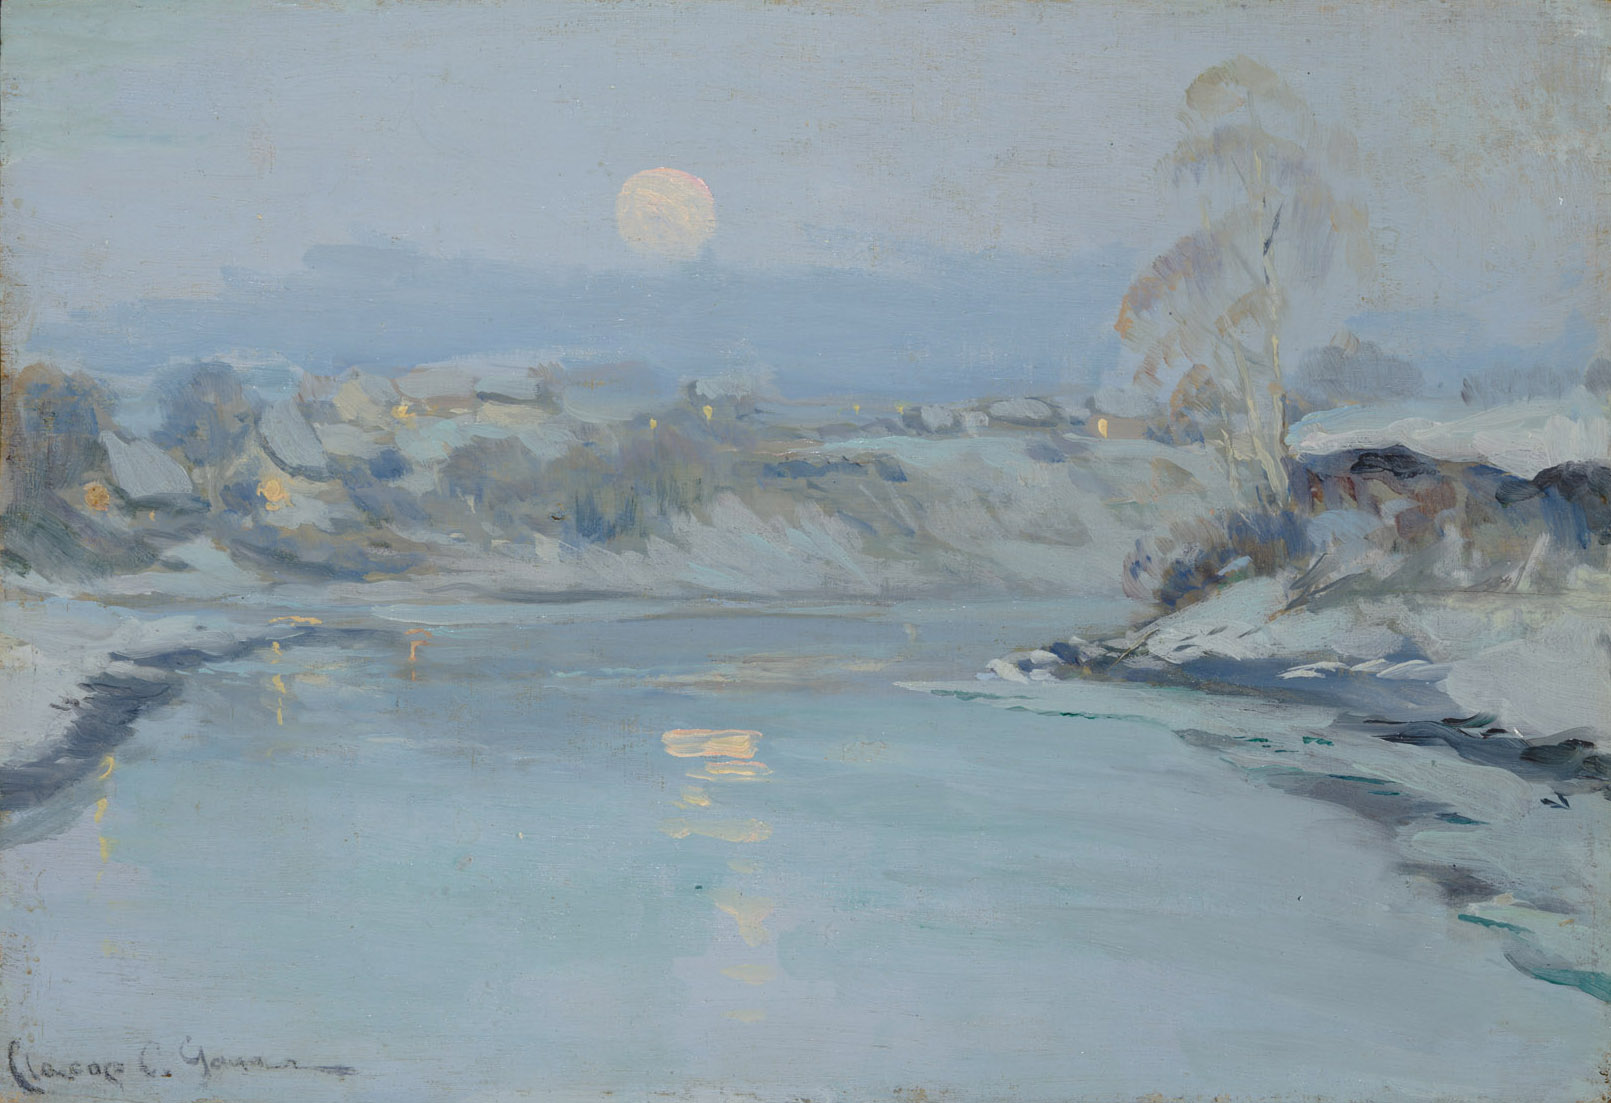 Clarence Gagnon, Lever de lune